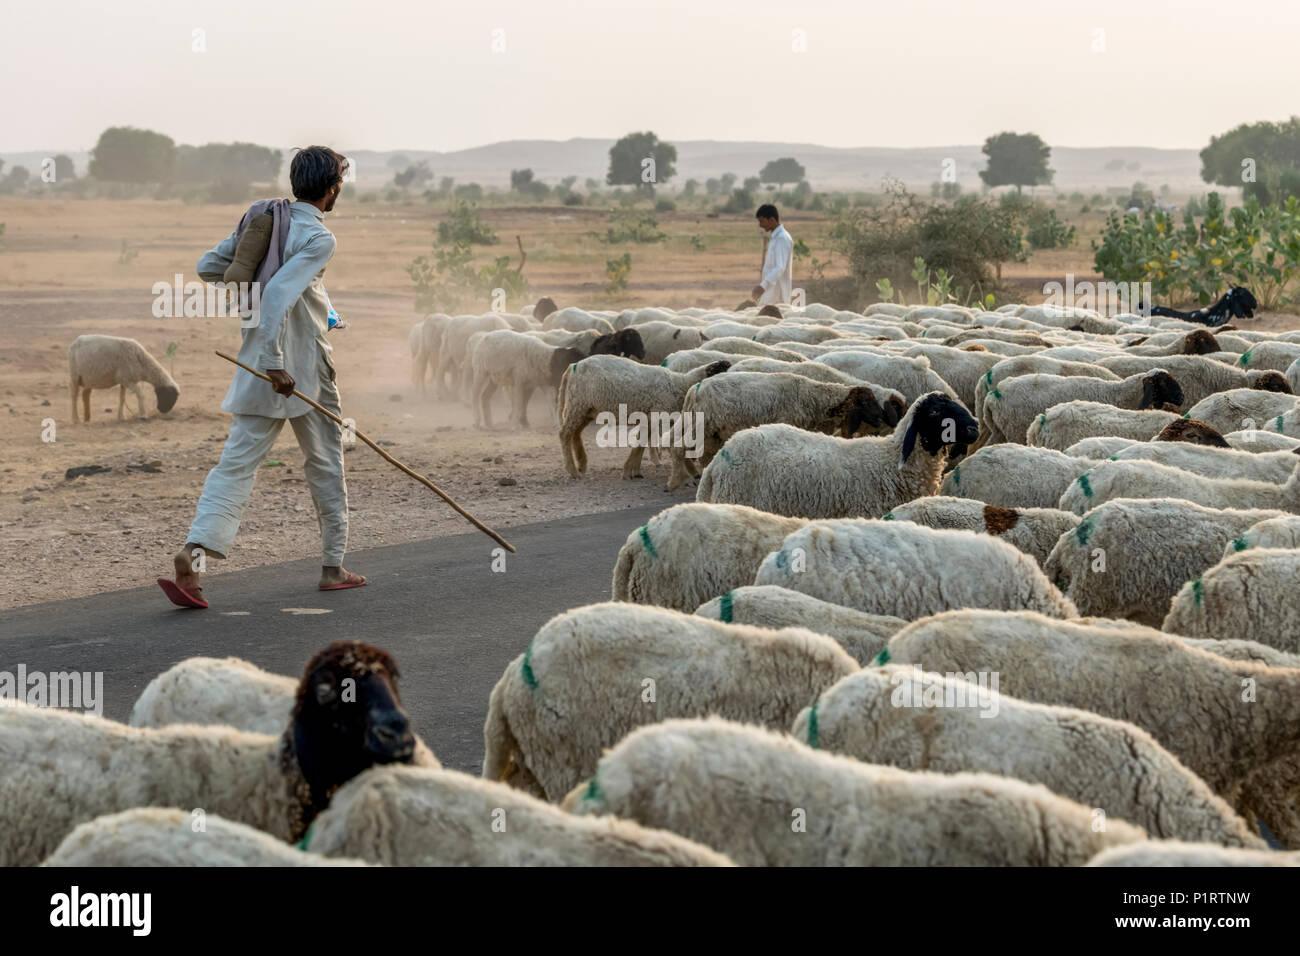 Men herding a flock of sheep along a road; Damodara, Rajasthan, India - Stock Image